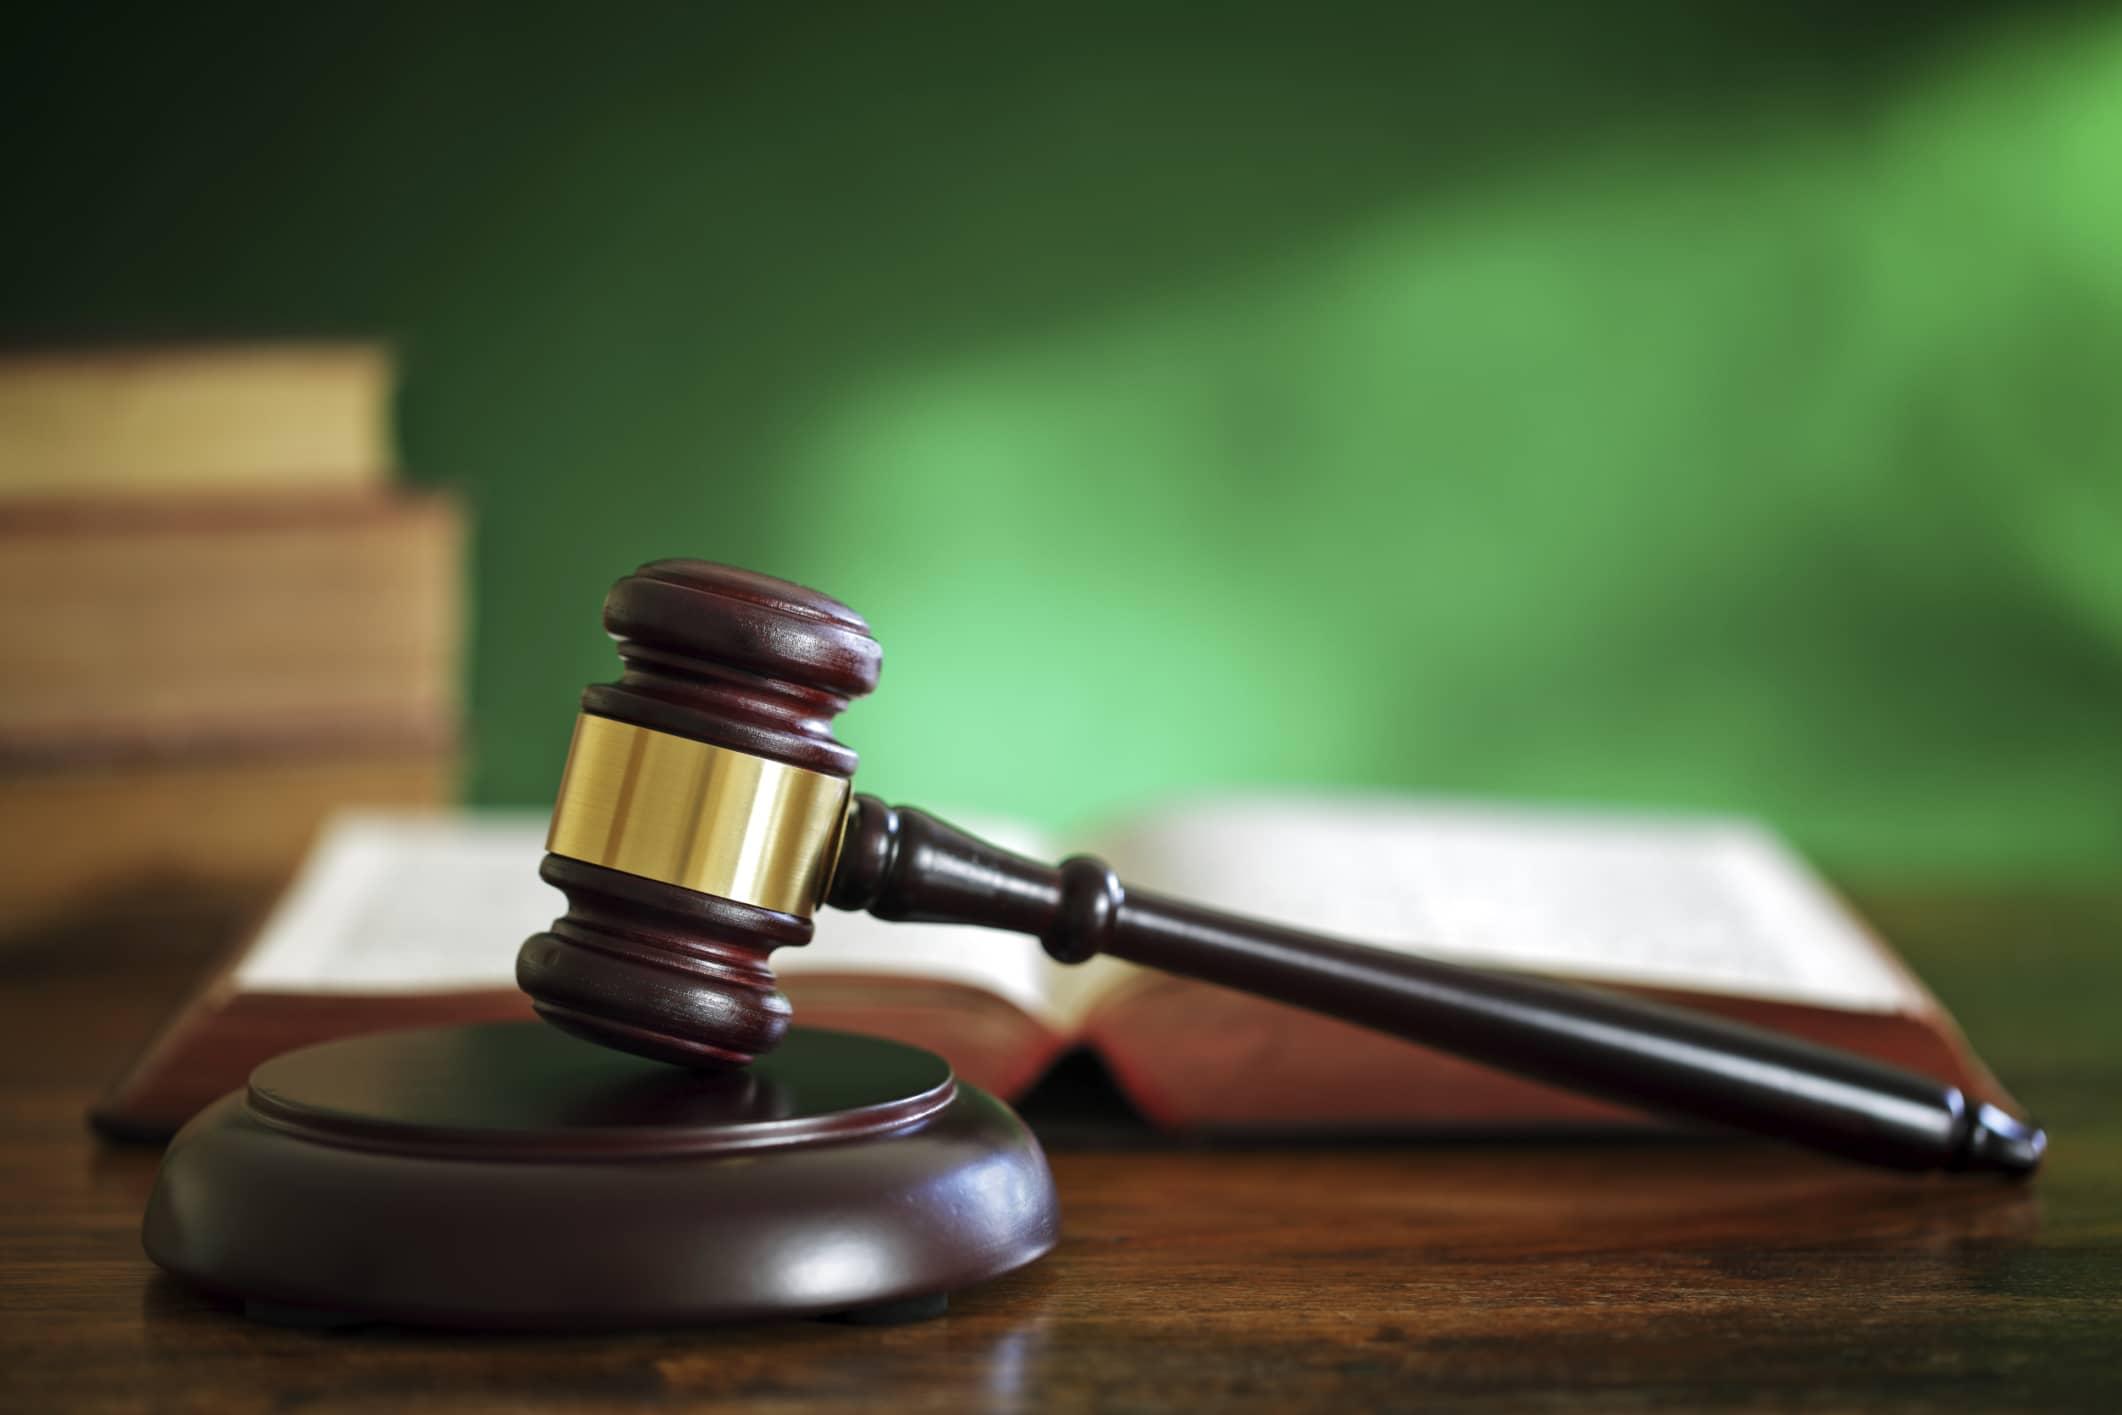 Jinkosolar Rec Group And Longi Solar Respond To Patent Infringement